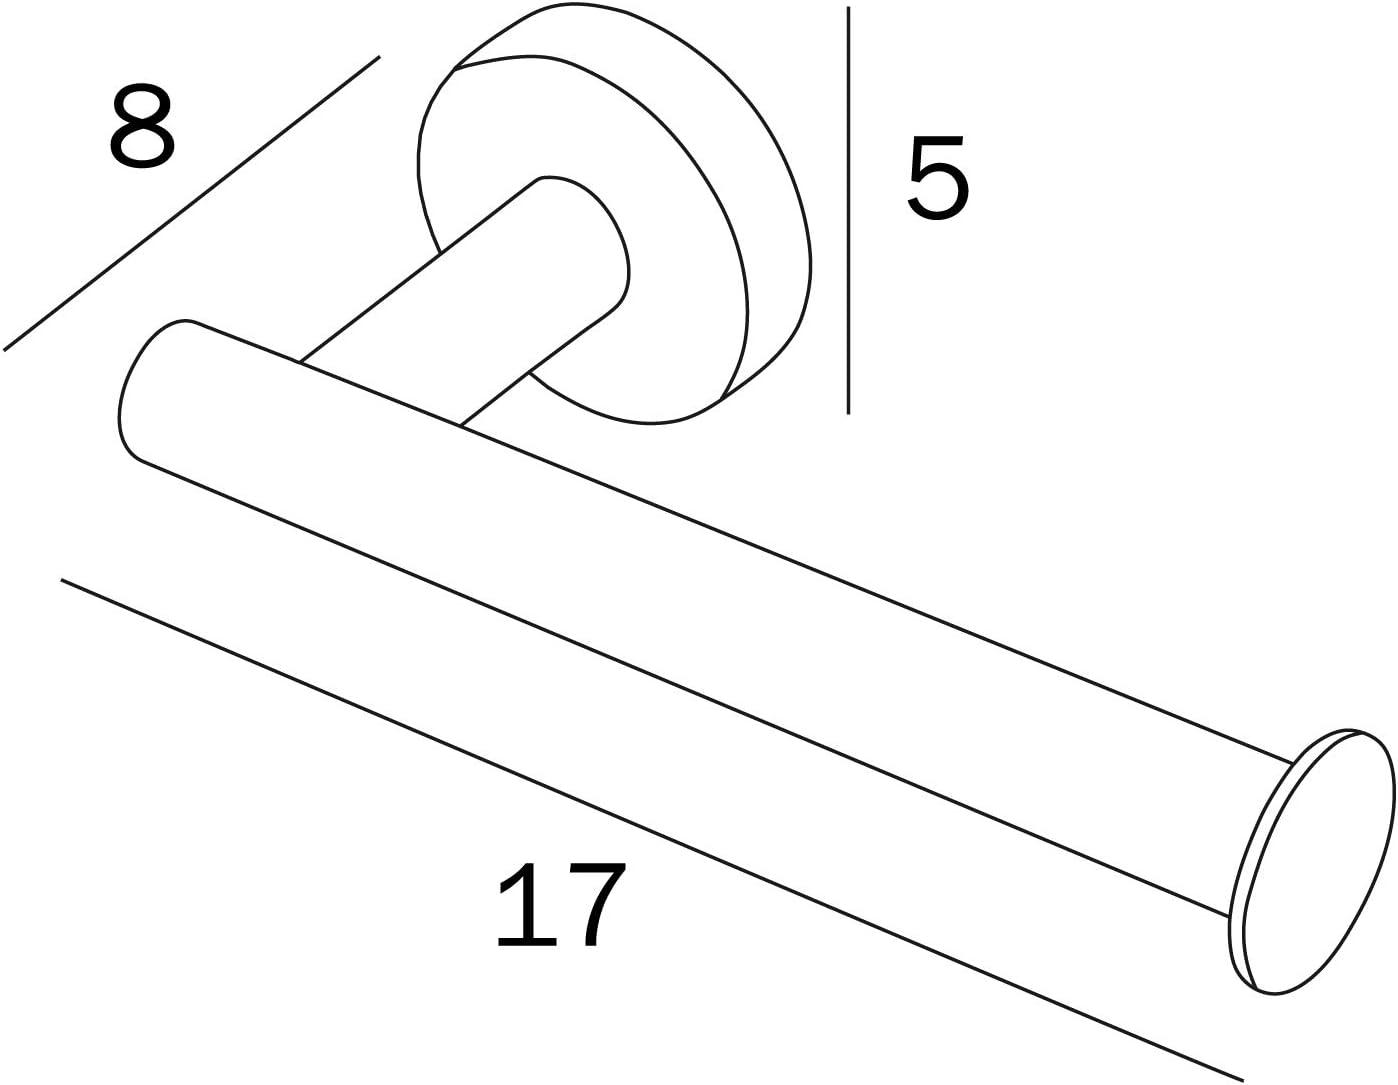 8 x 17 x 5 cm INDA Styl Porte-Papier Toilette en Acier Inoxydable Blanc